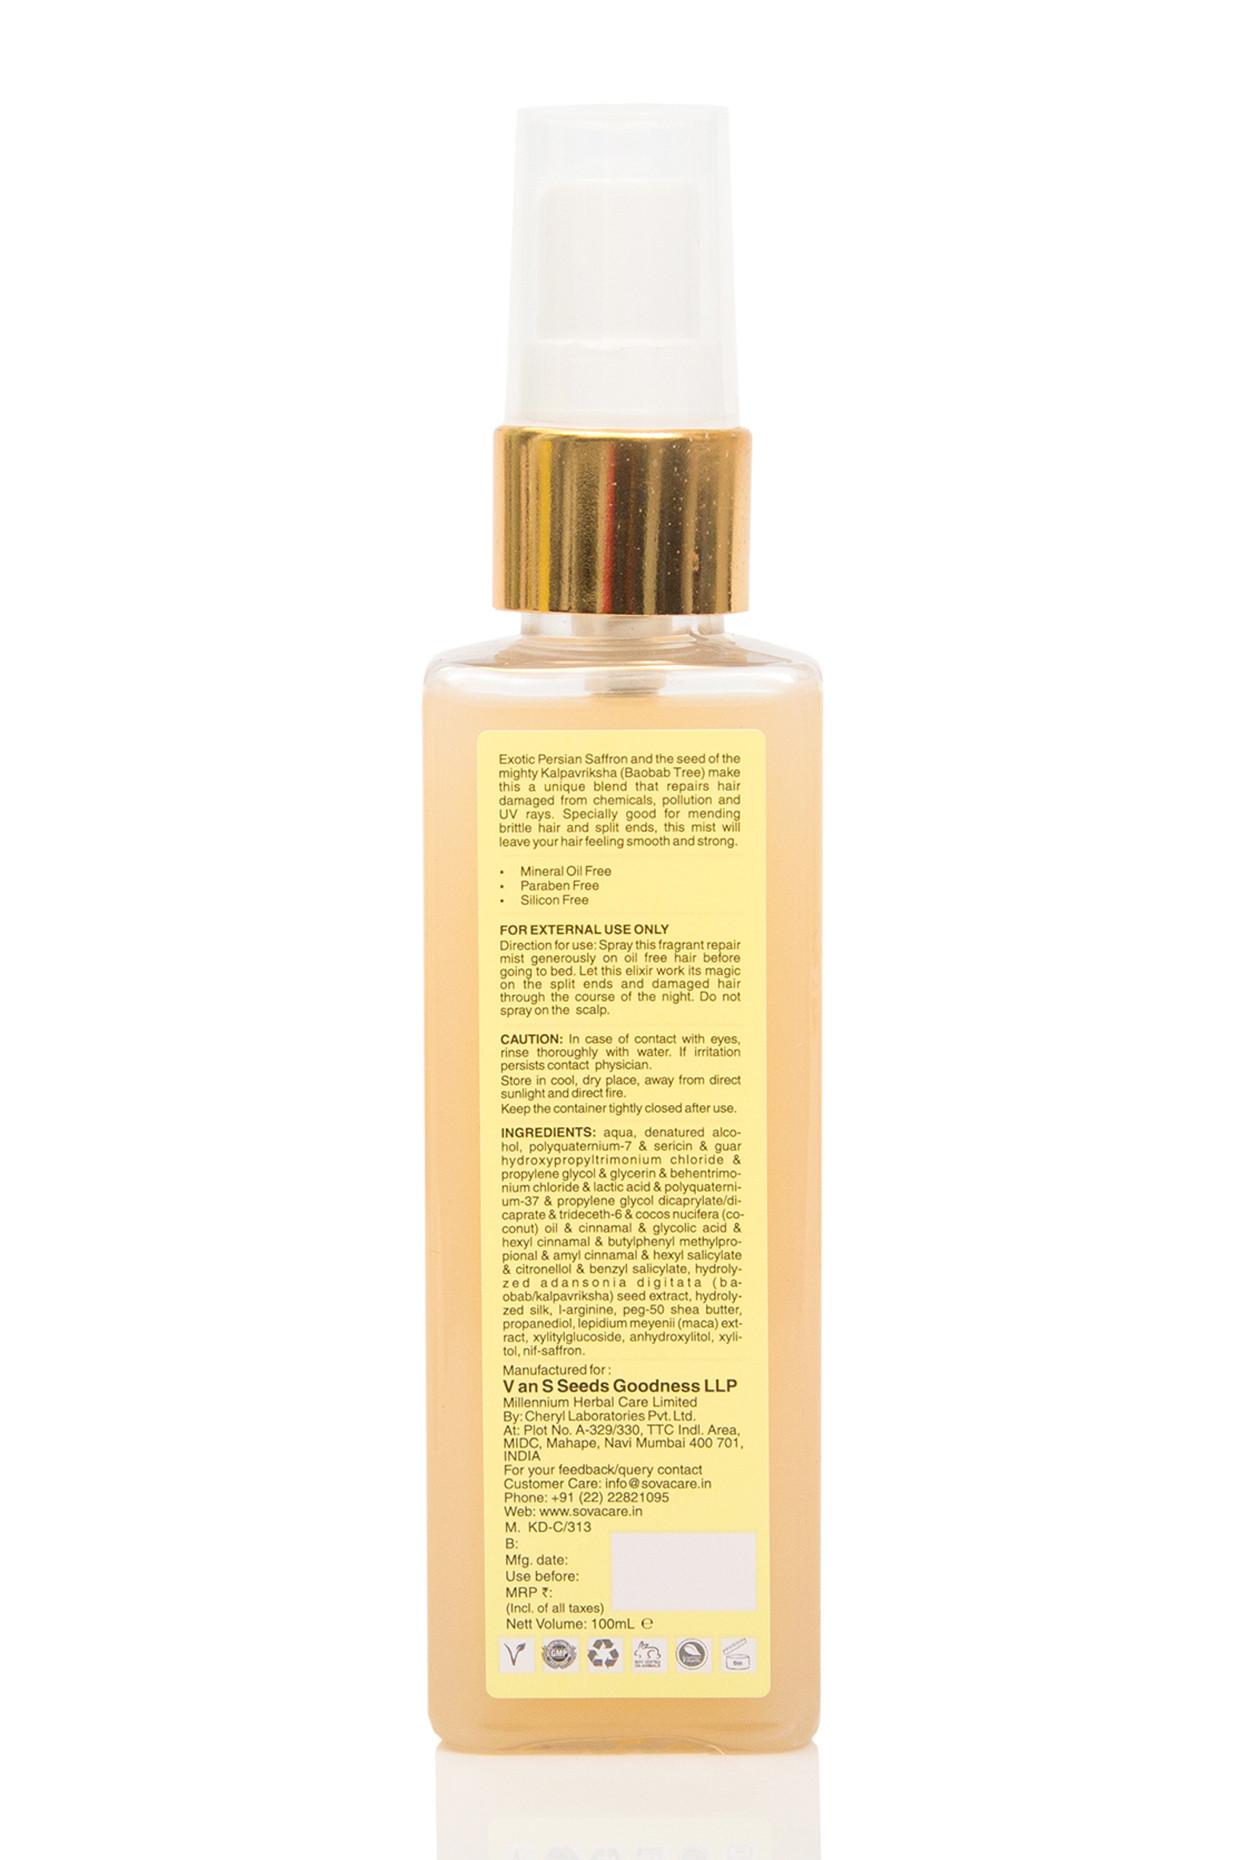 Kalpavriksha Seed & Saffron Overnight Hair Repair Mist For All Hair Types by SOVA